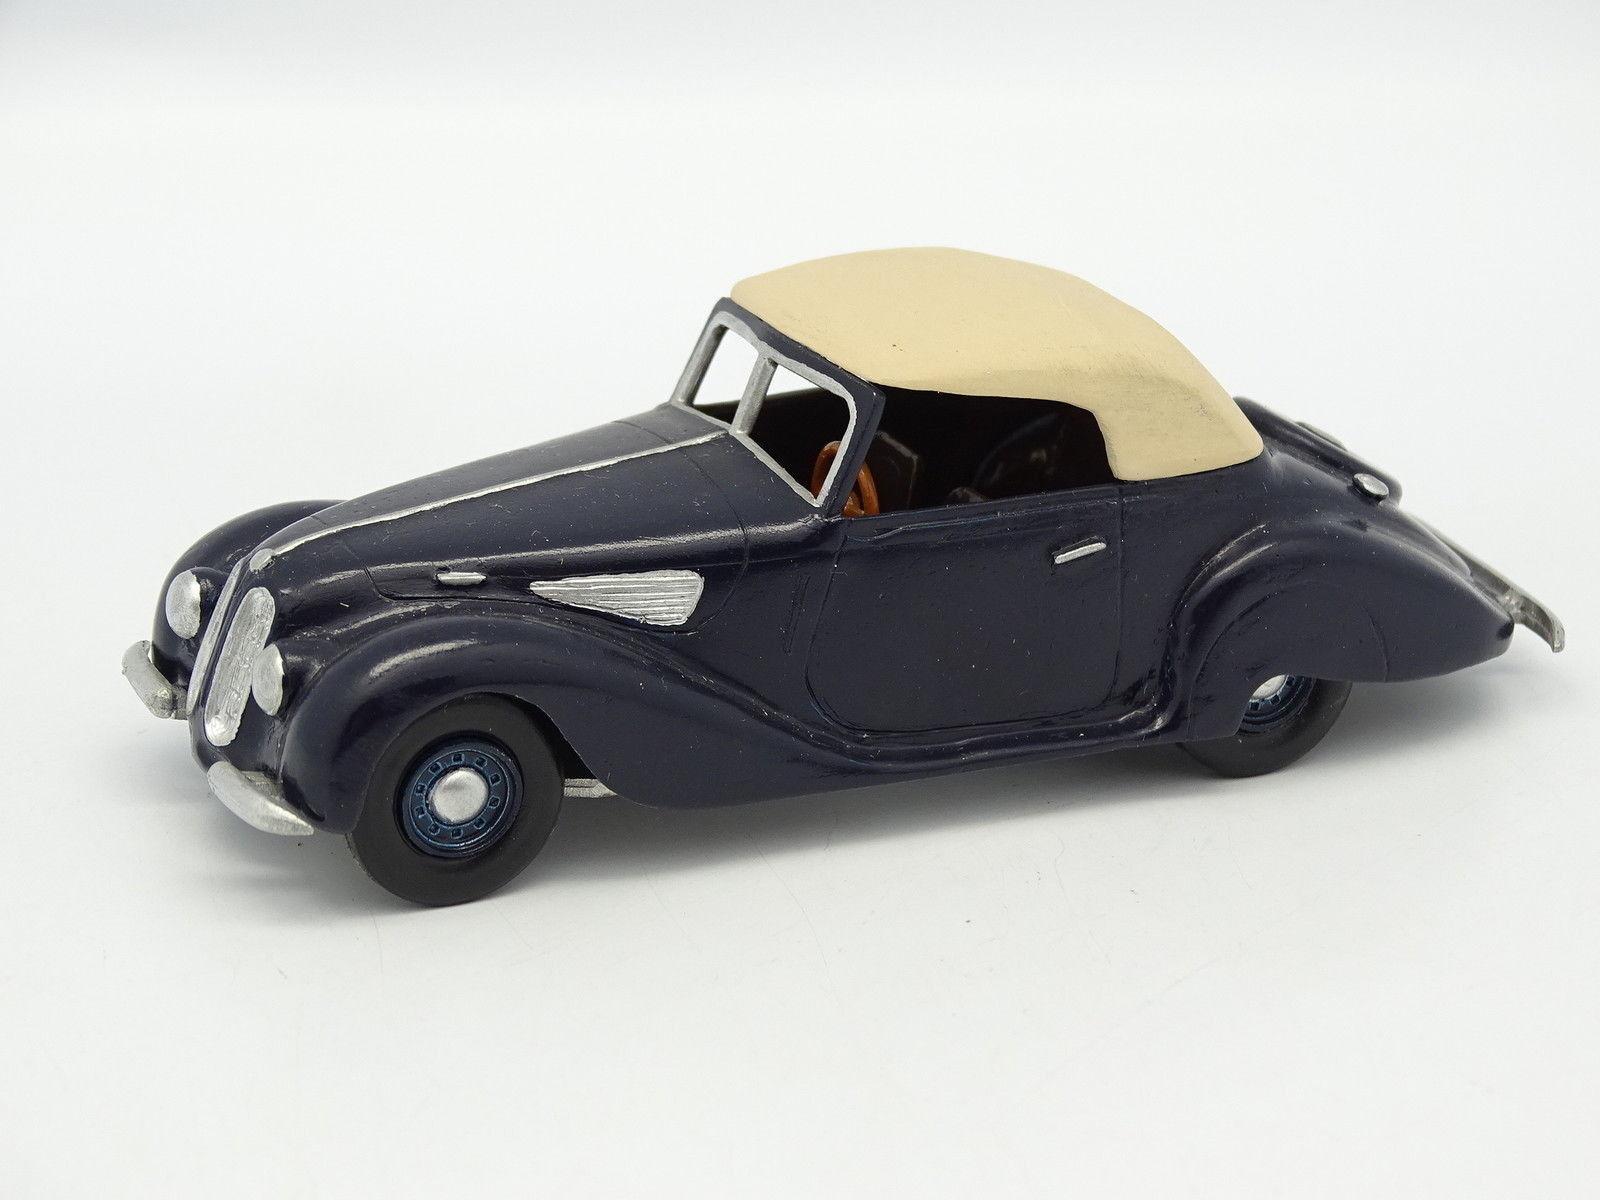 Danhausen Kit Assembled Metal 1 43 - BMW 327 Cabriolet blueee